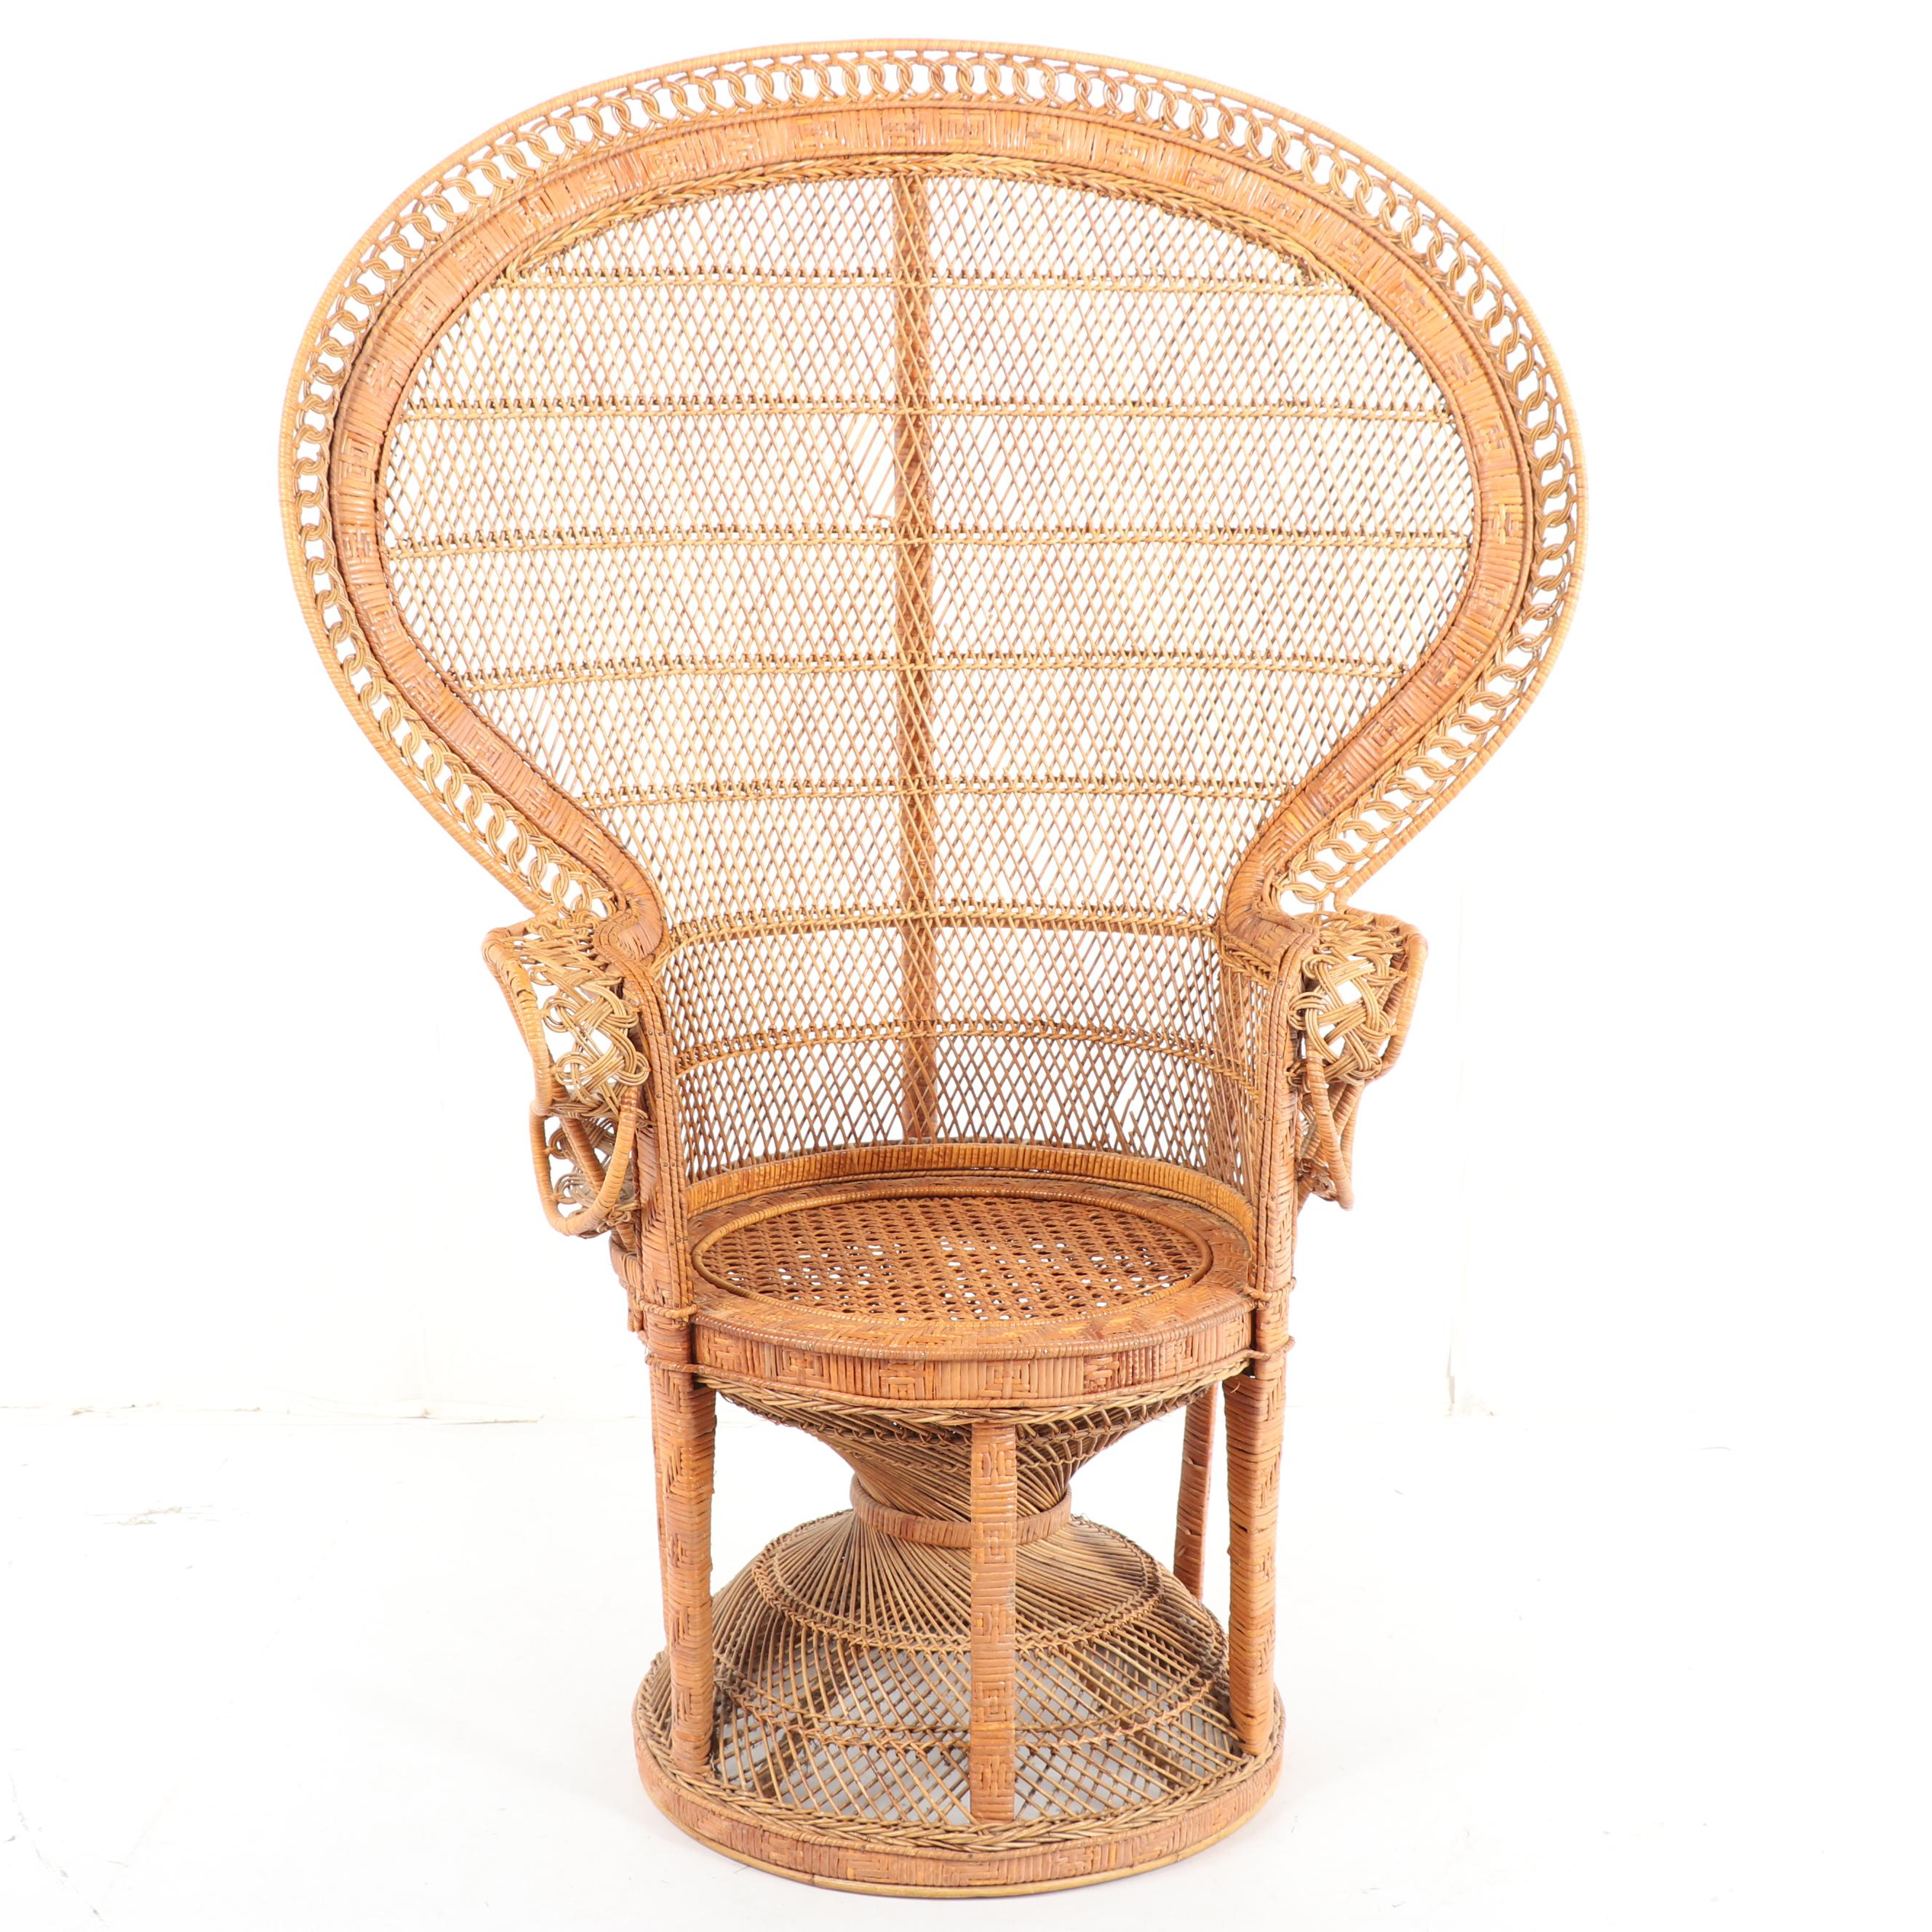 rattan peacock chair parson cover pattern late 20th century ebth